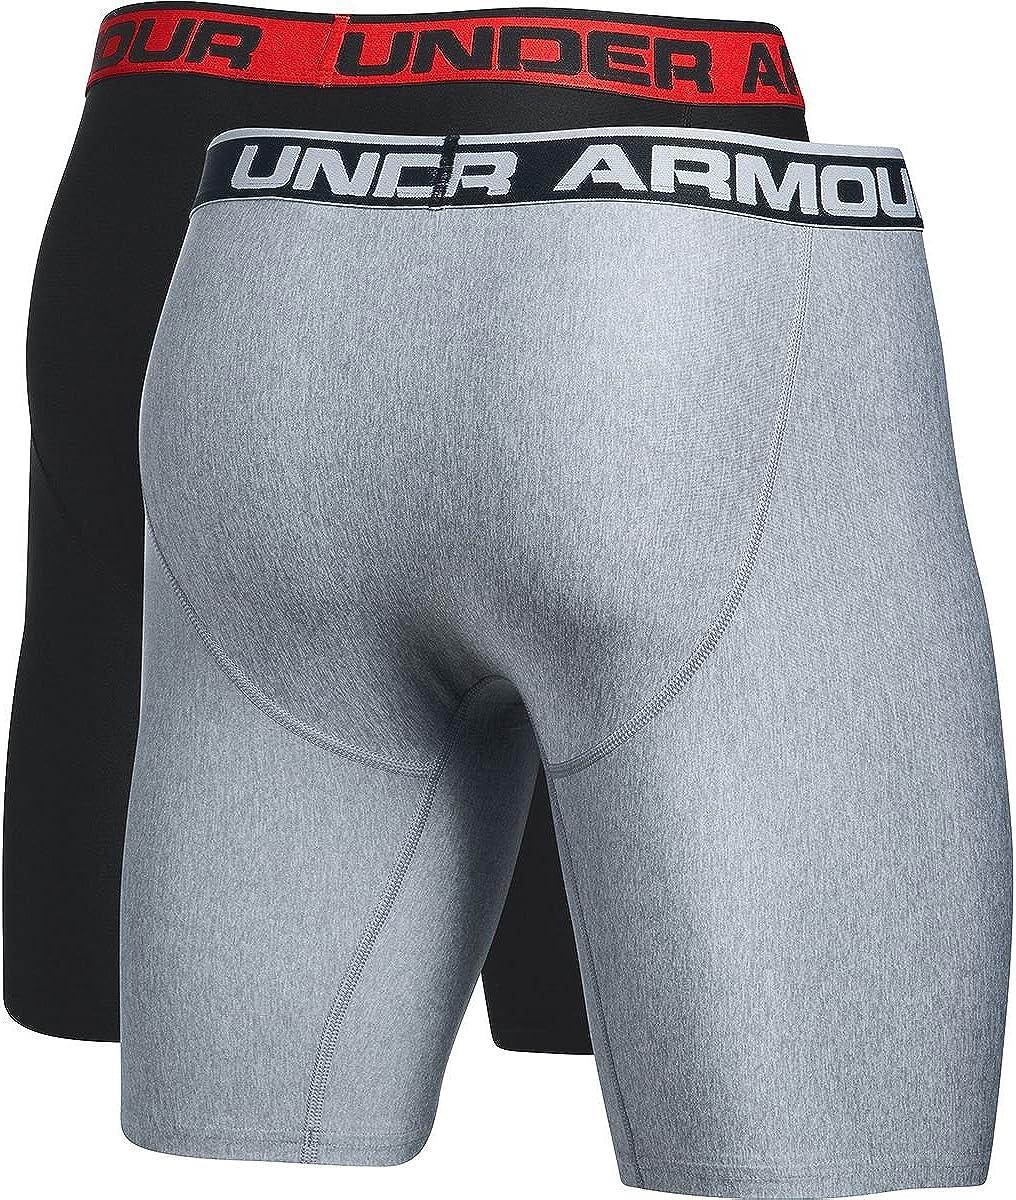 Under Armour O-Series 9in Boxerjock -2-Pack - Men's Black/Steel Light Heather, XXL